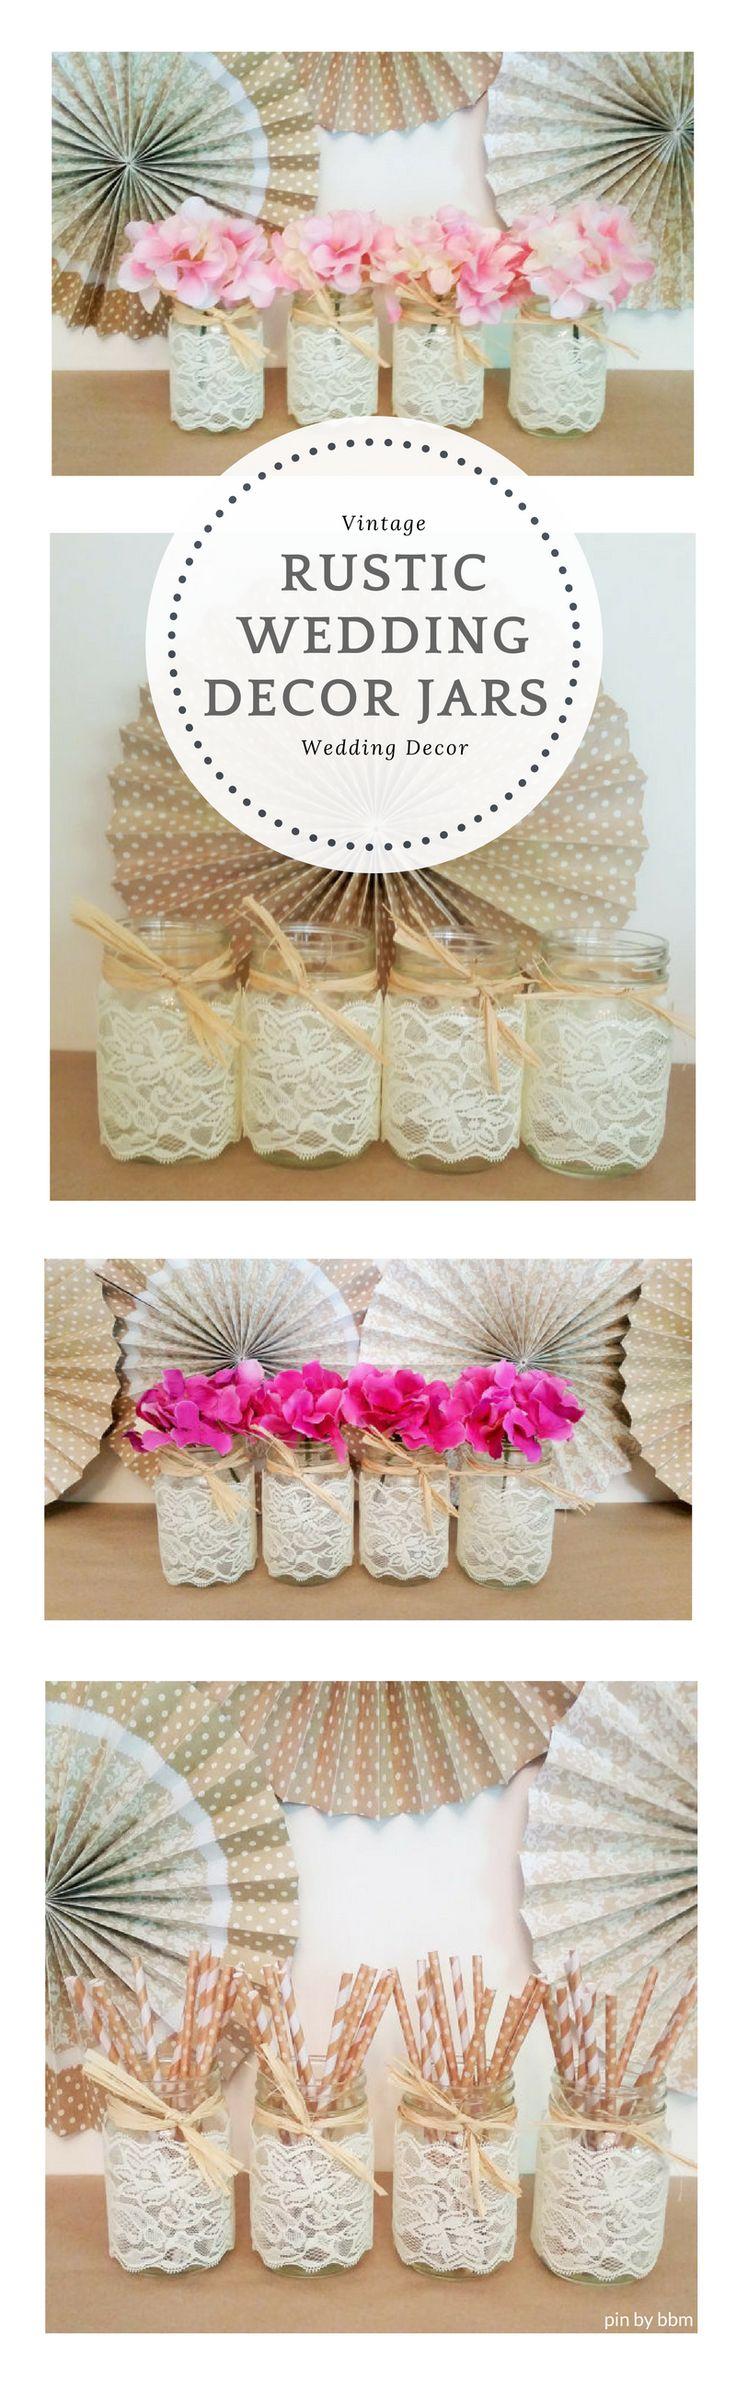 Pretty Rustic Country Wedding Decor Mason Jars, cute wedding table center pieces! found #ad Etsy. #rusticwedding #countrywedding #weddingdecor #bbmaff